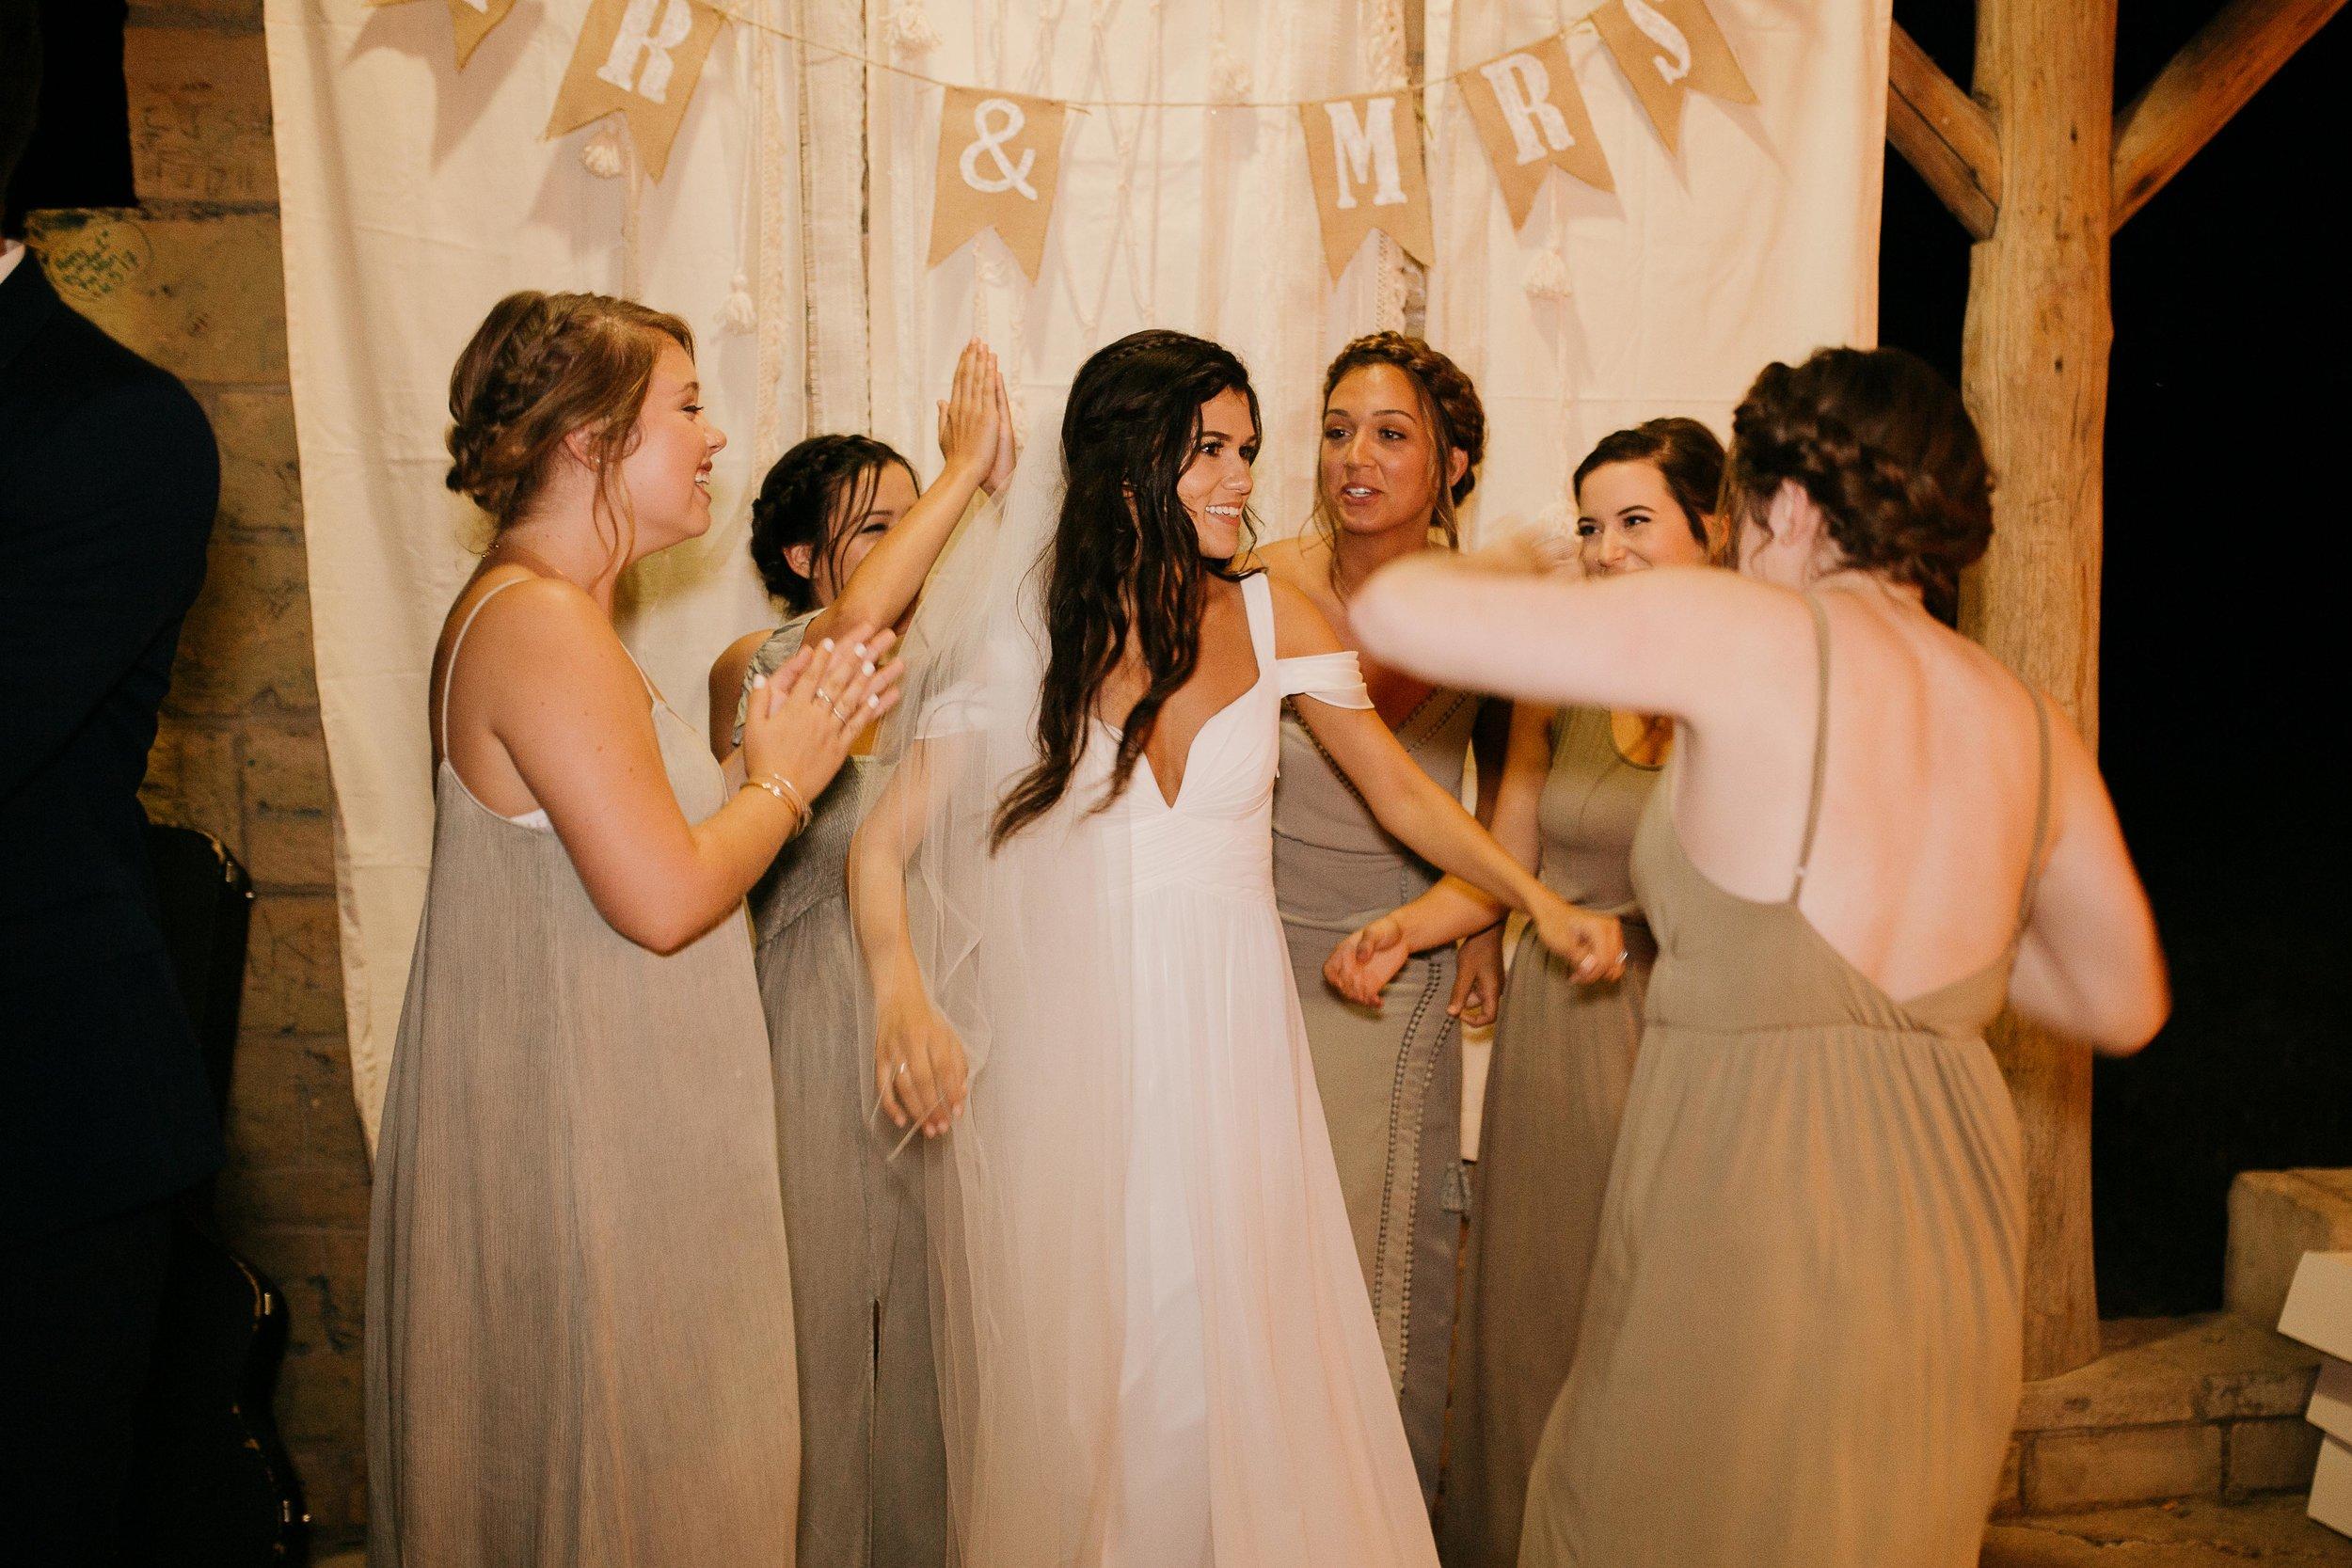 memphis tn wedding-144.jpg